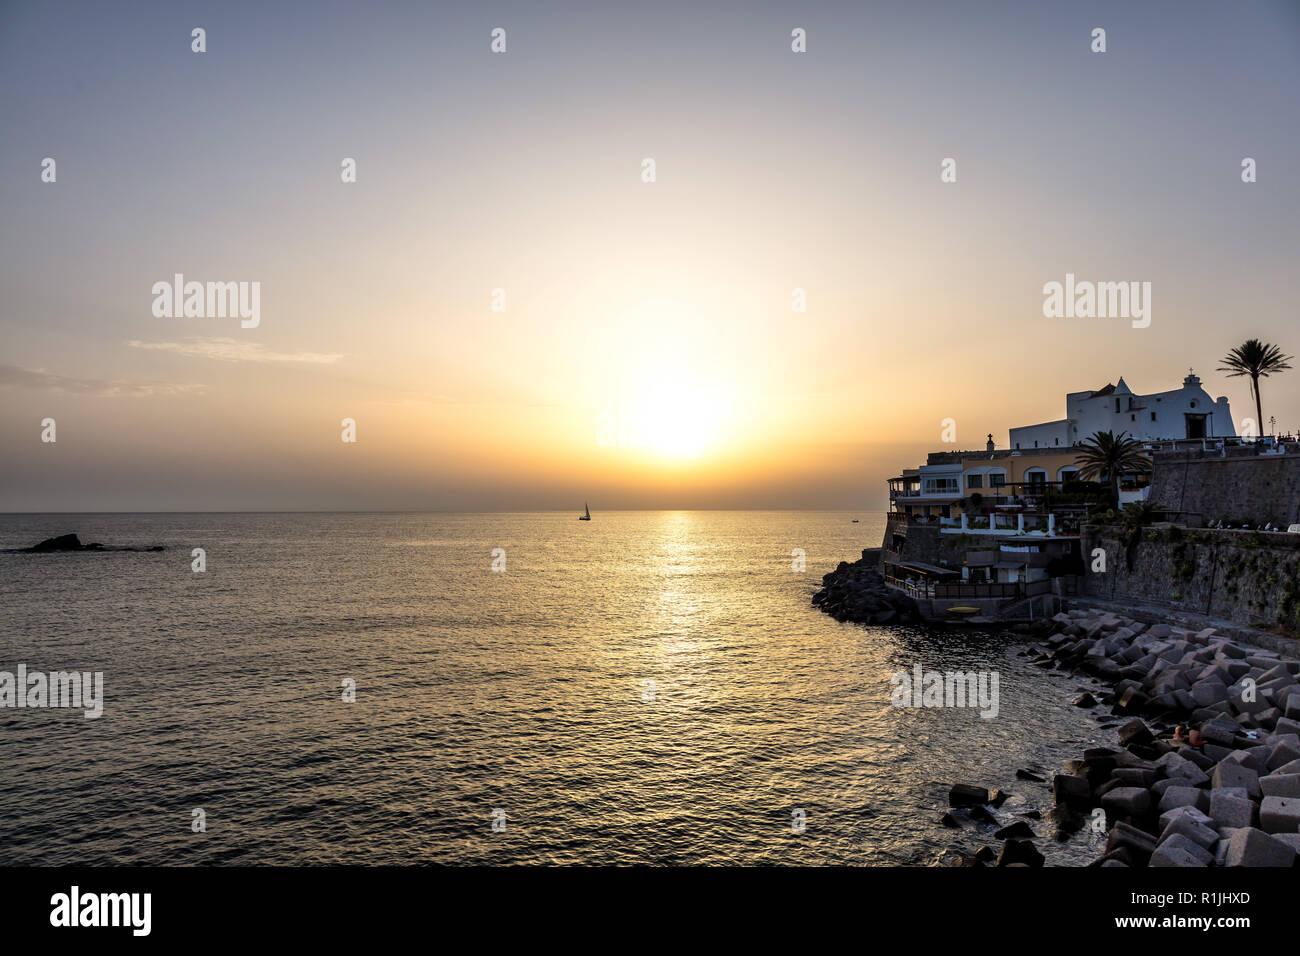 Sunset on the coast of Ischia, Gulf of Naples, Campania region, Italy - Stock Image